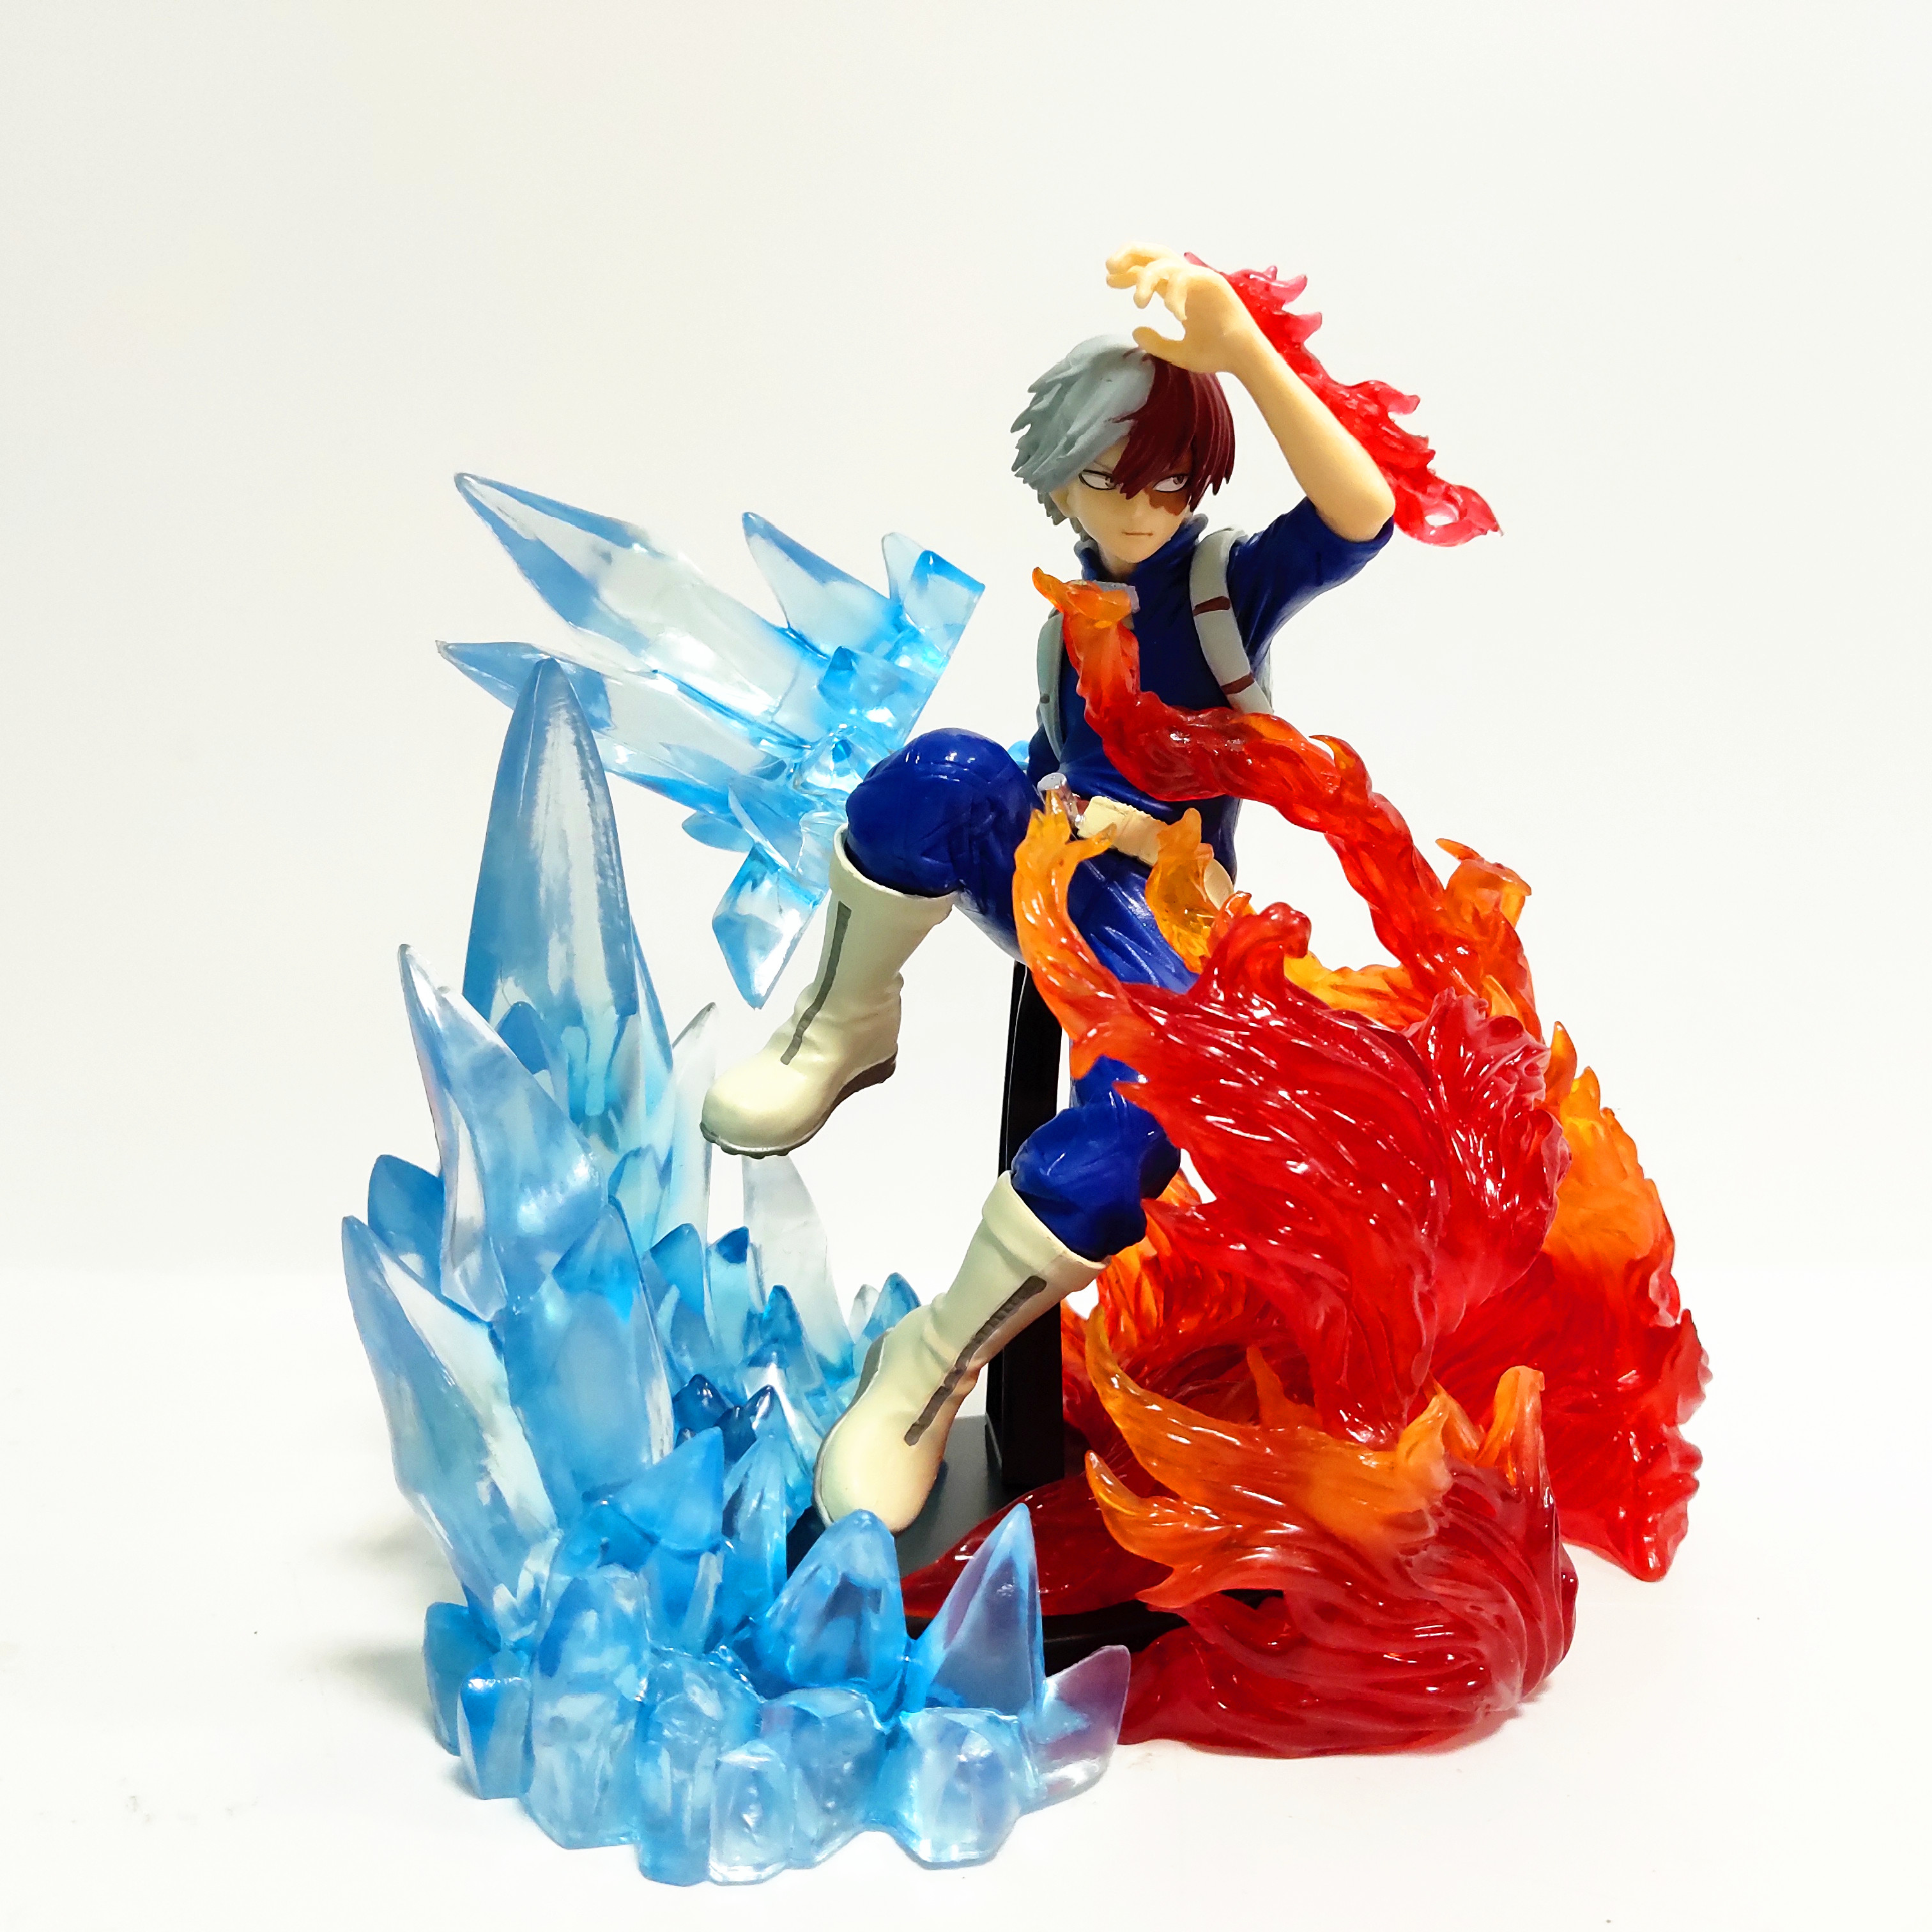 Collections Anime Jouets My Hero Academia Todoroki Shoto Figurine Statues 15cm